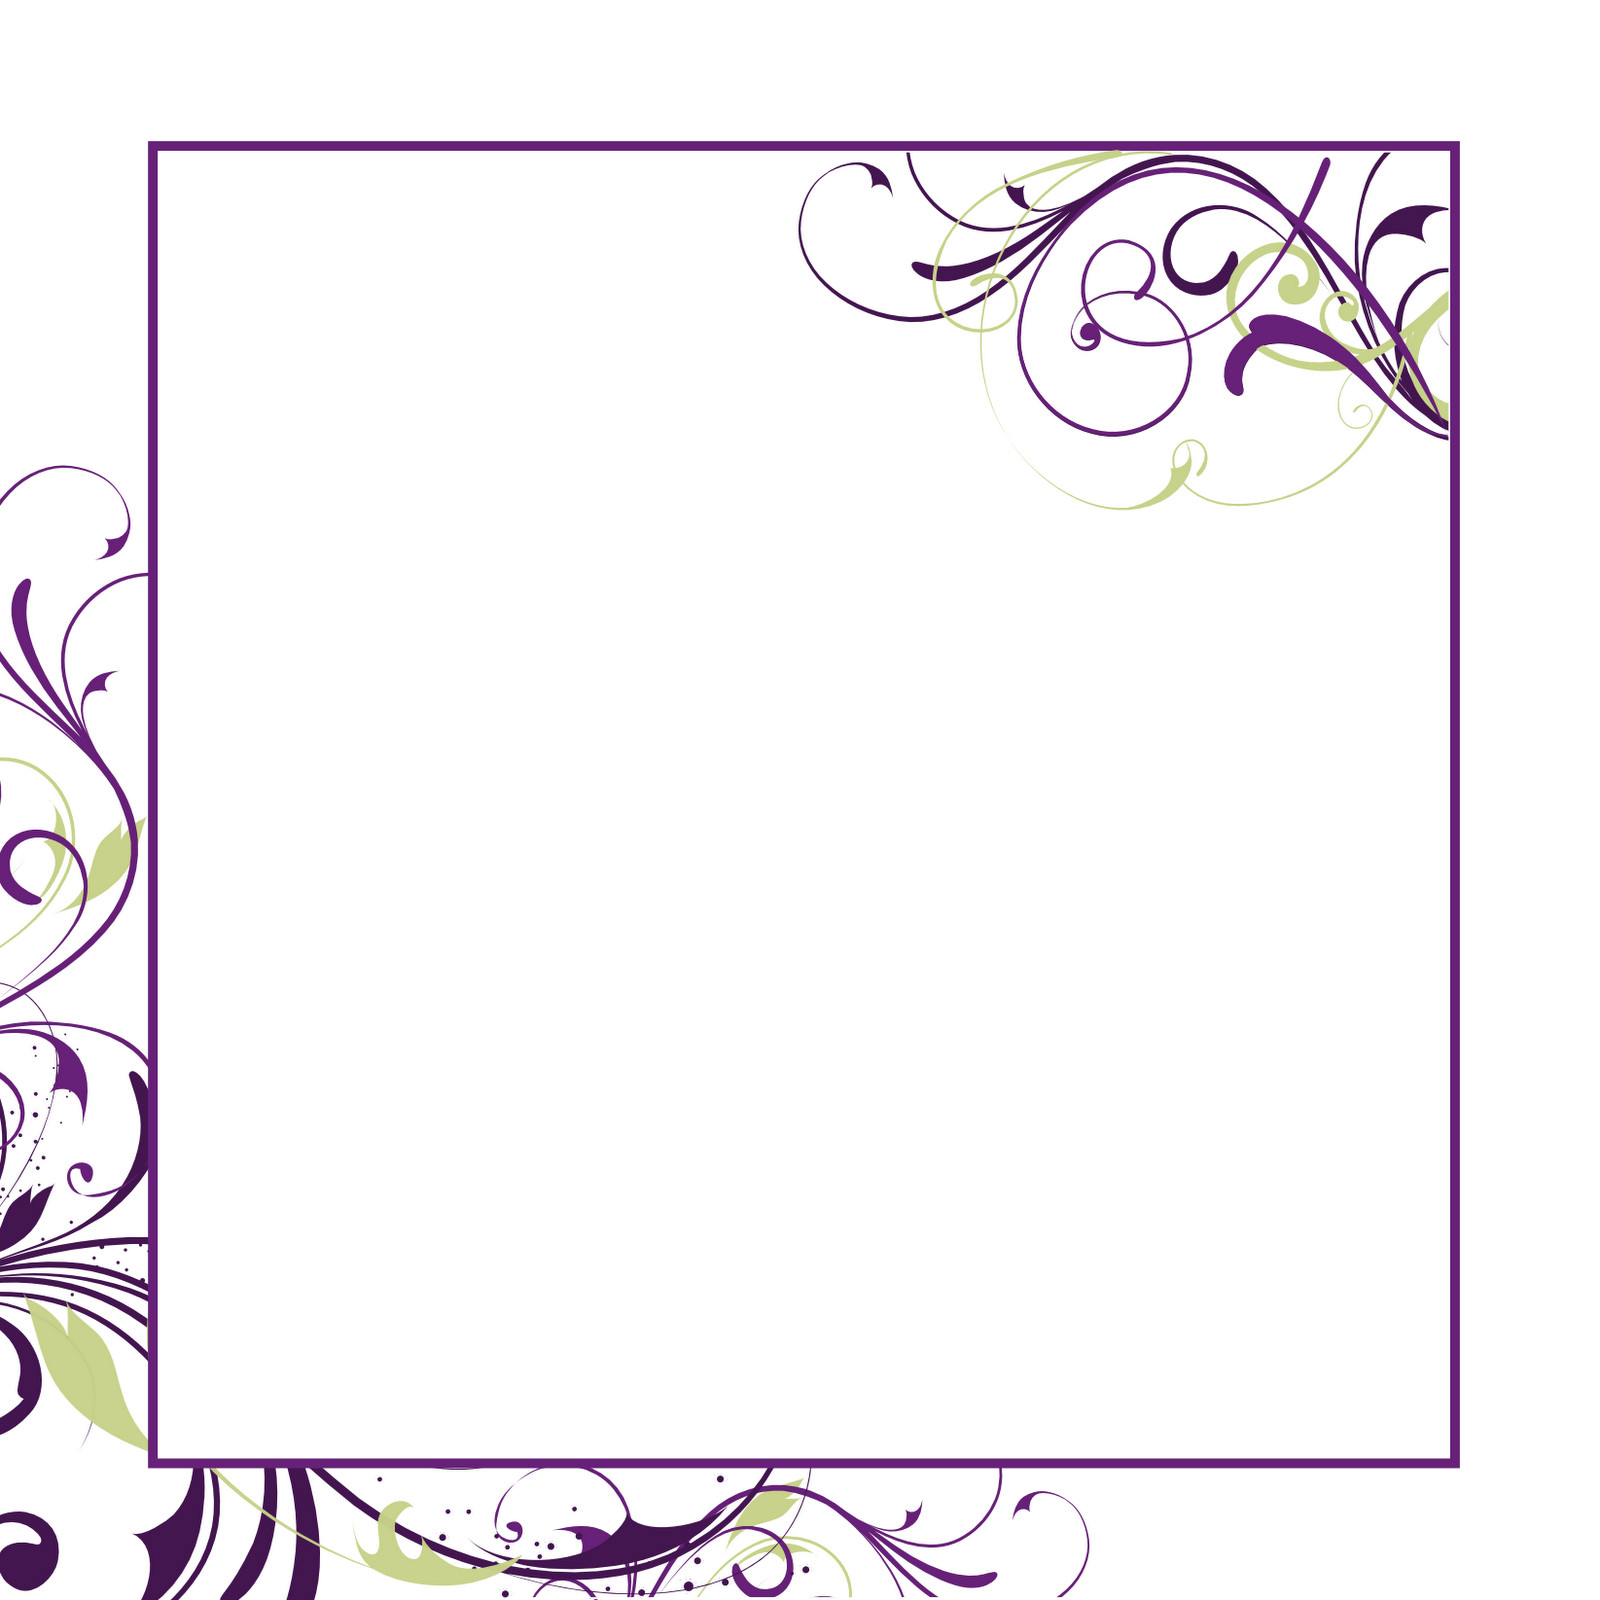 Free Blank Invitation Templates Free Invitation Templates Printable theagiot Mhf4ydhe